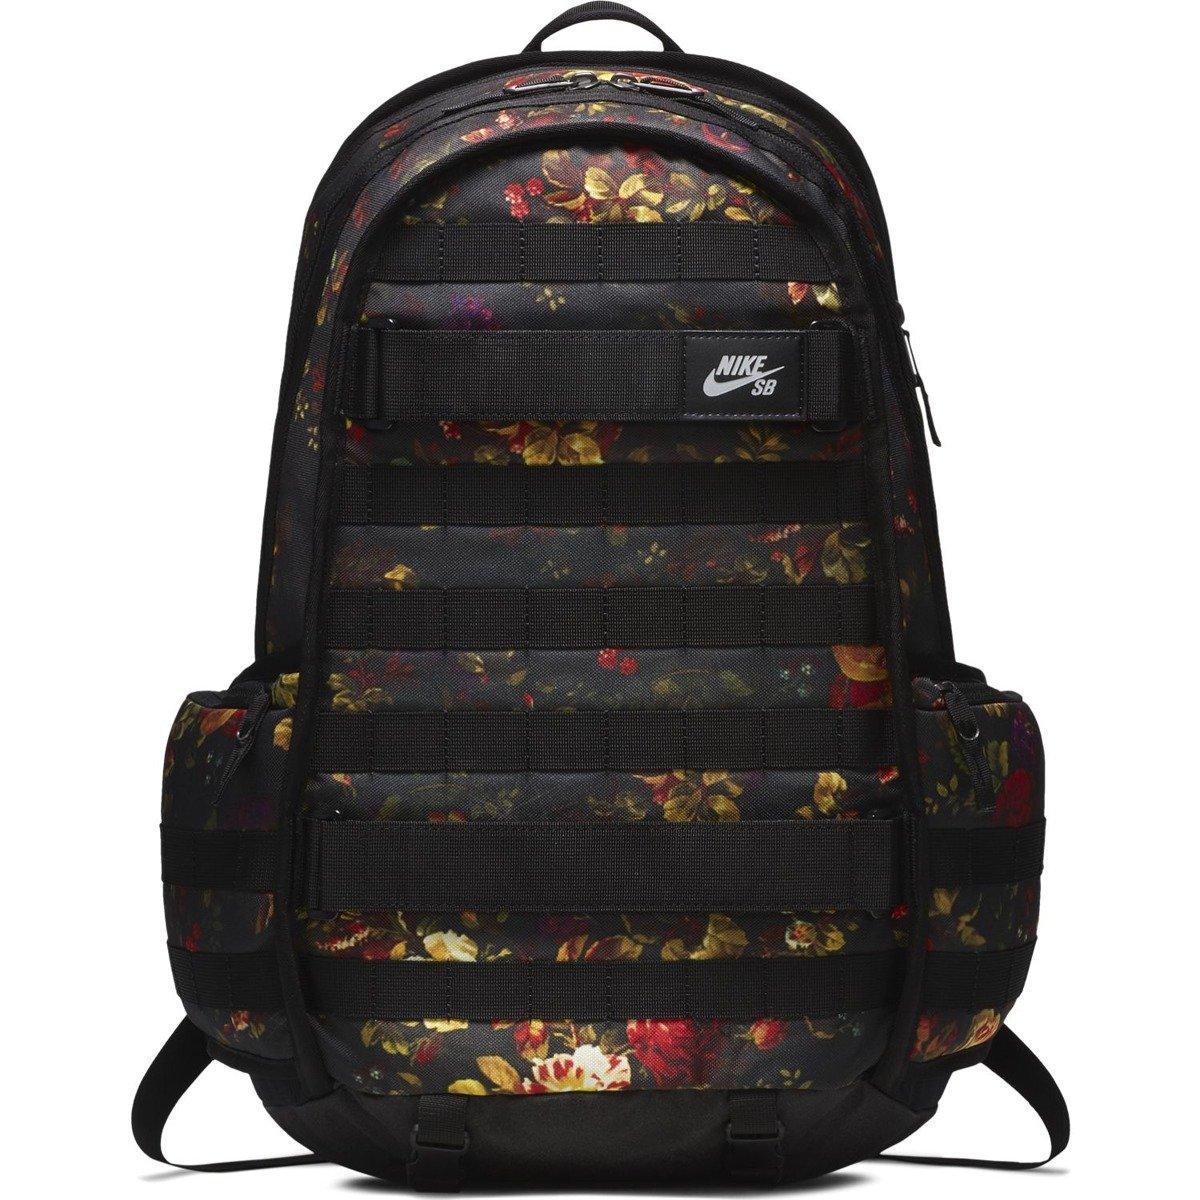 972626b8f Miniramp Skateshop plecak nikesb rpm floral